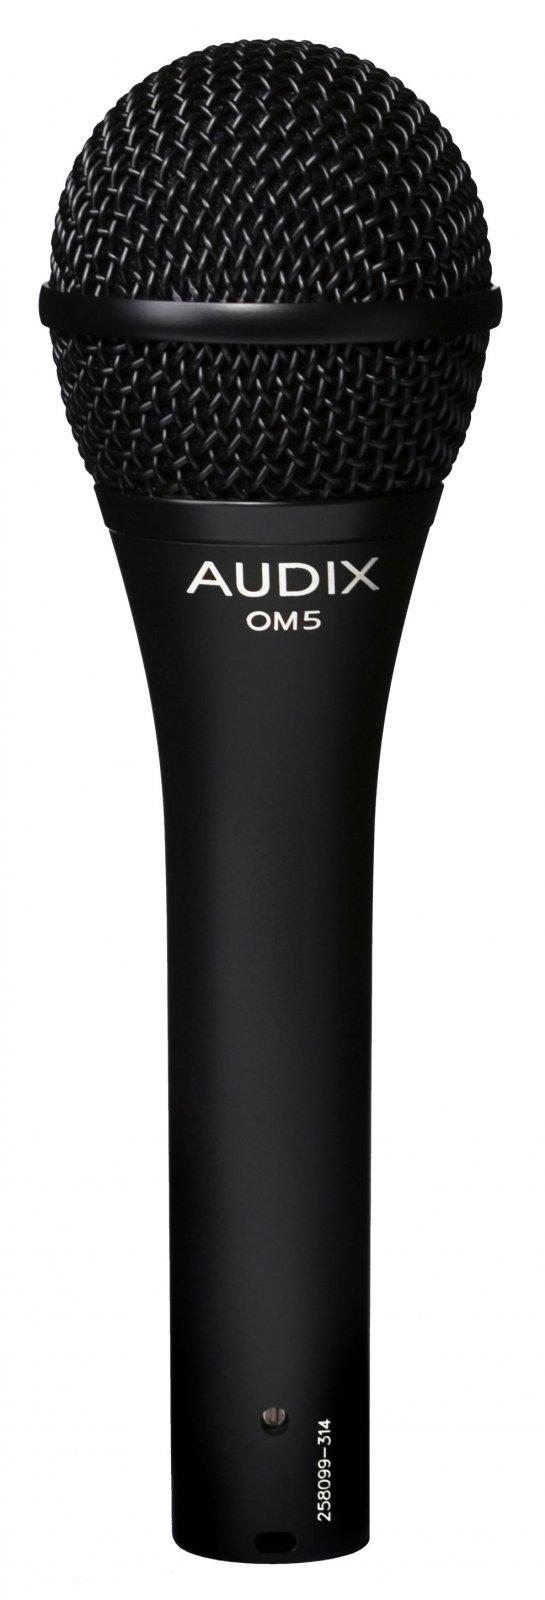 AUDIX OM5 DYNAMIC MIC